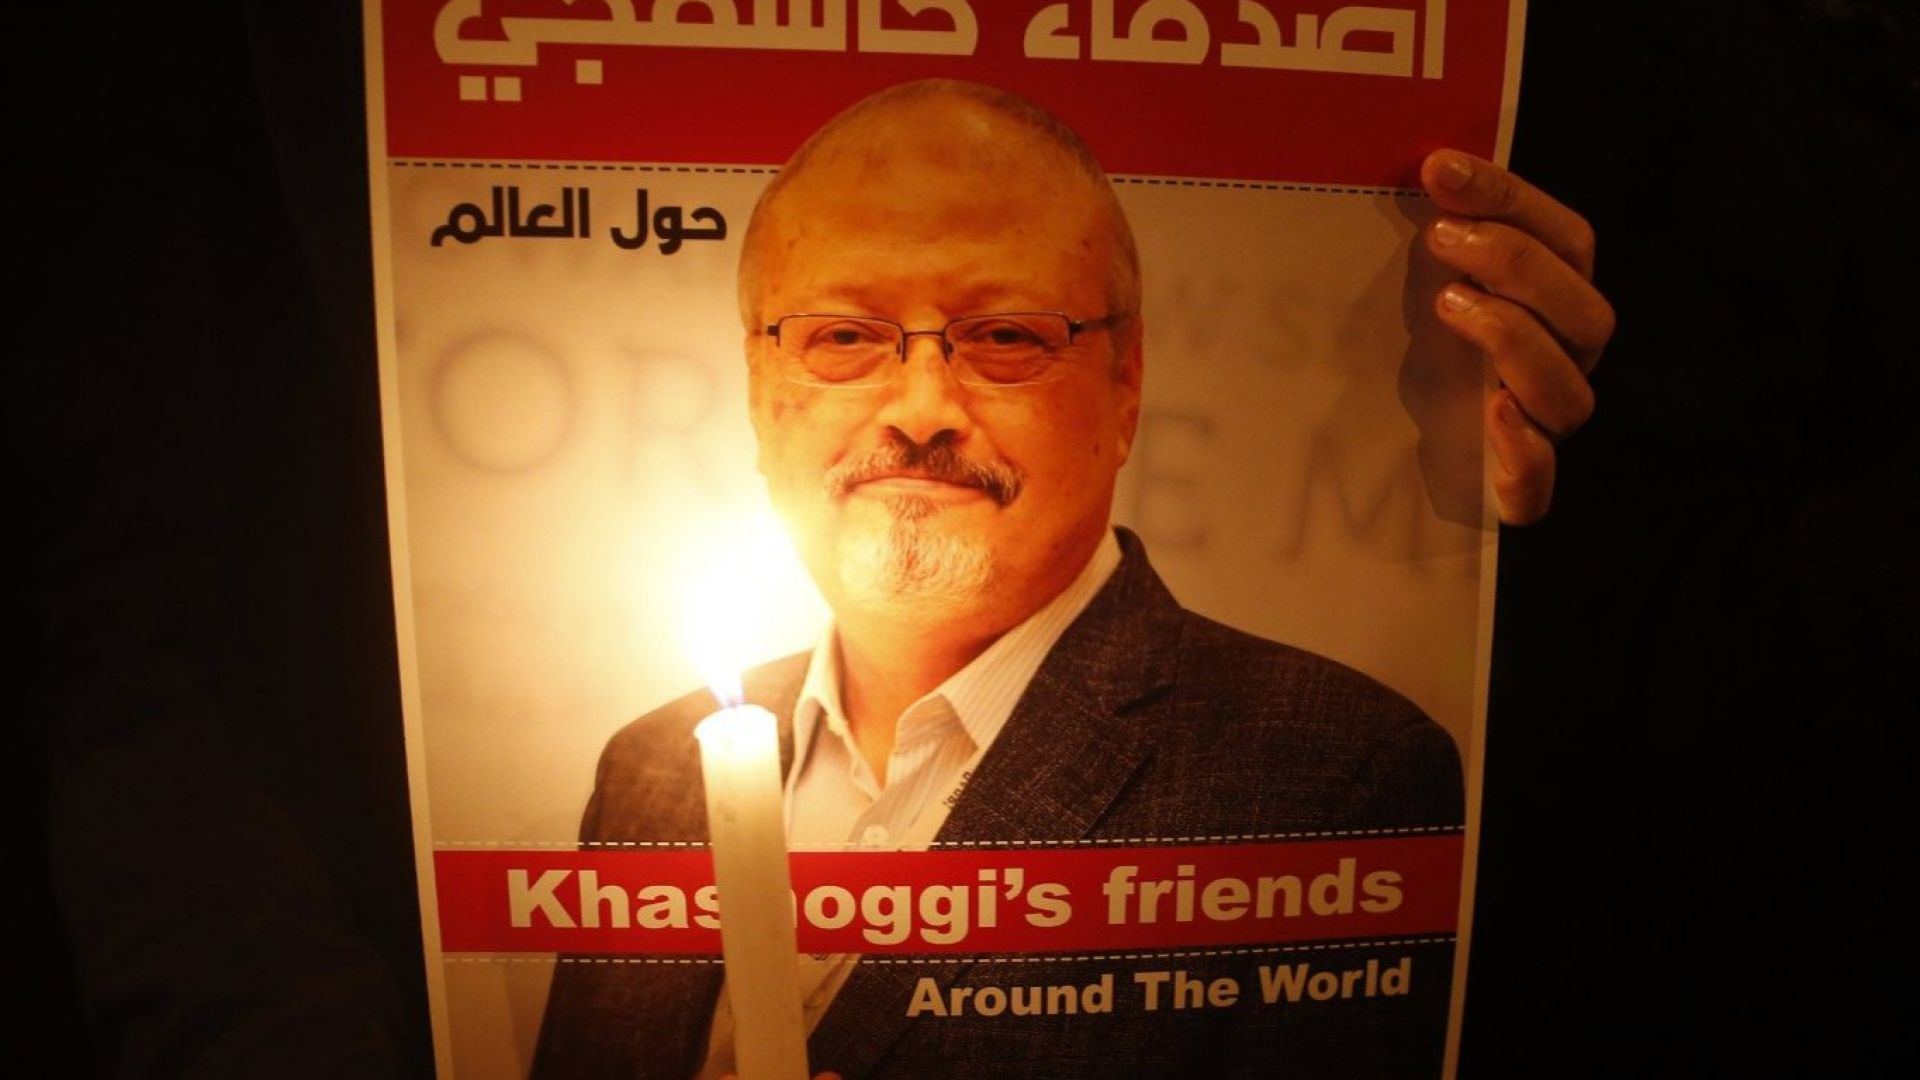 Година след убийството на Кашоги, принц Салман все така здраво държи властта